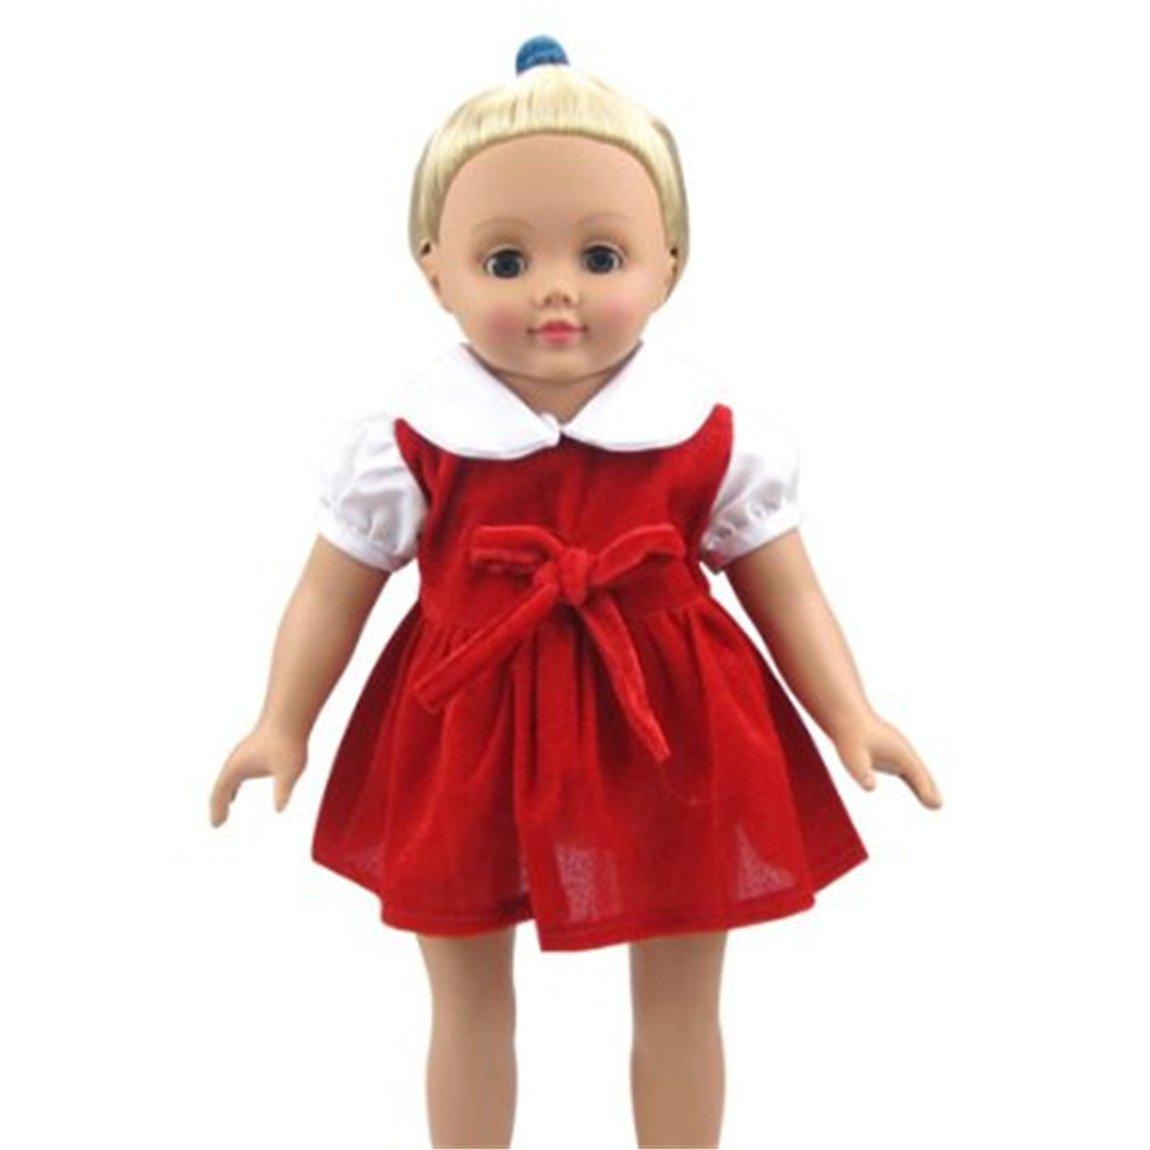 e7e8d051d8ff Amazon.com  JELEUON Cute Baby Beautiful Red Velvet Doll Dresses ...